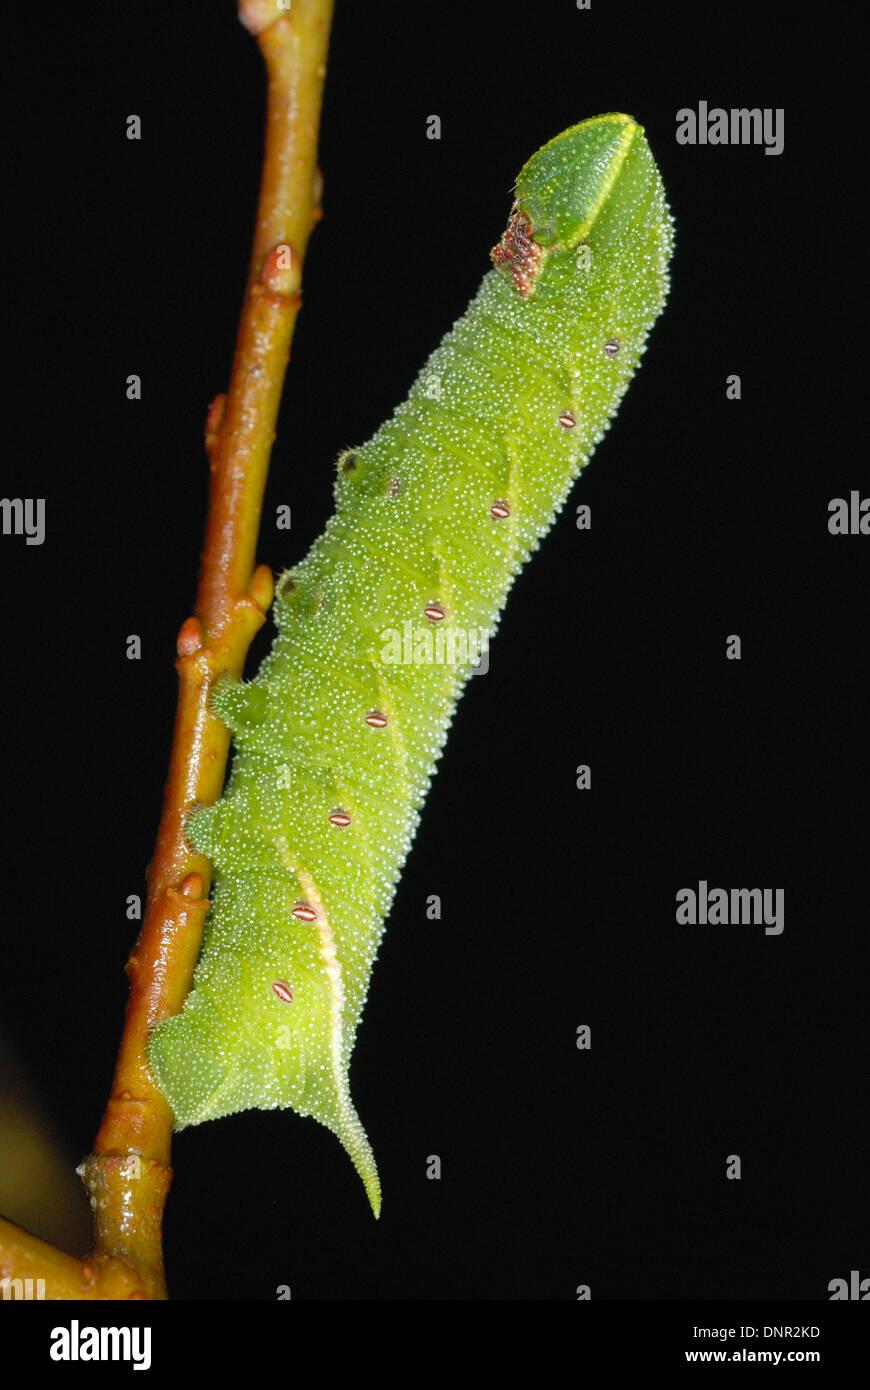 Poplar Hawk Moth Caterpillar (Laothoe populi) - Stock Image